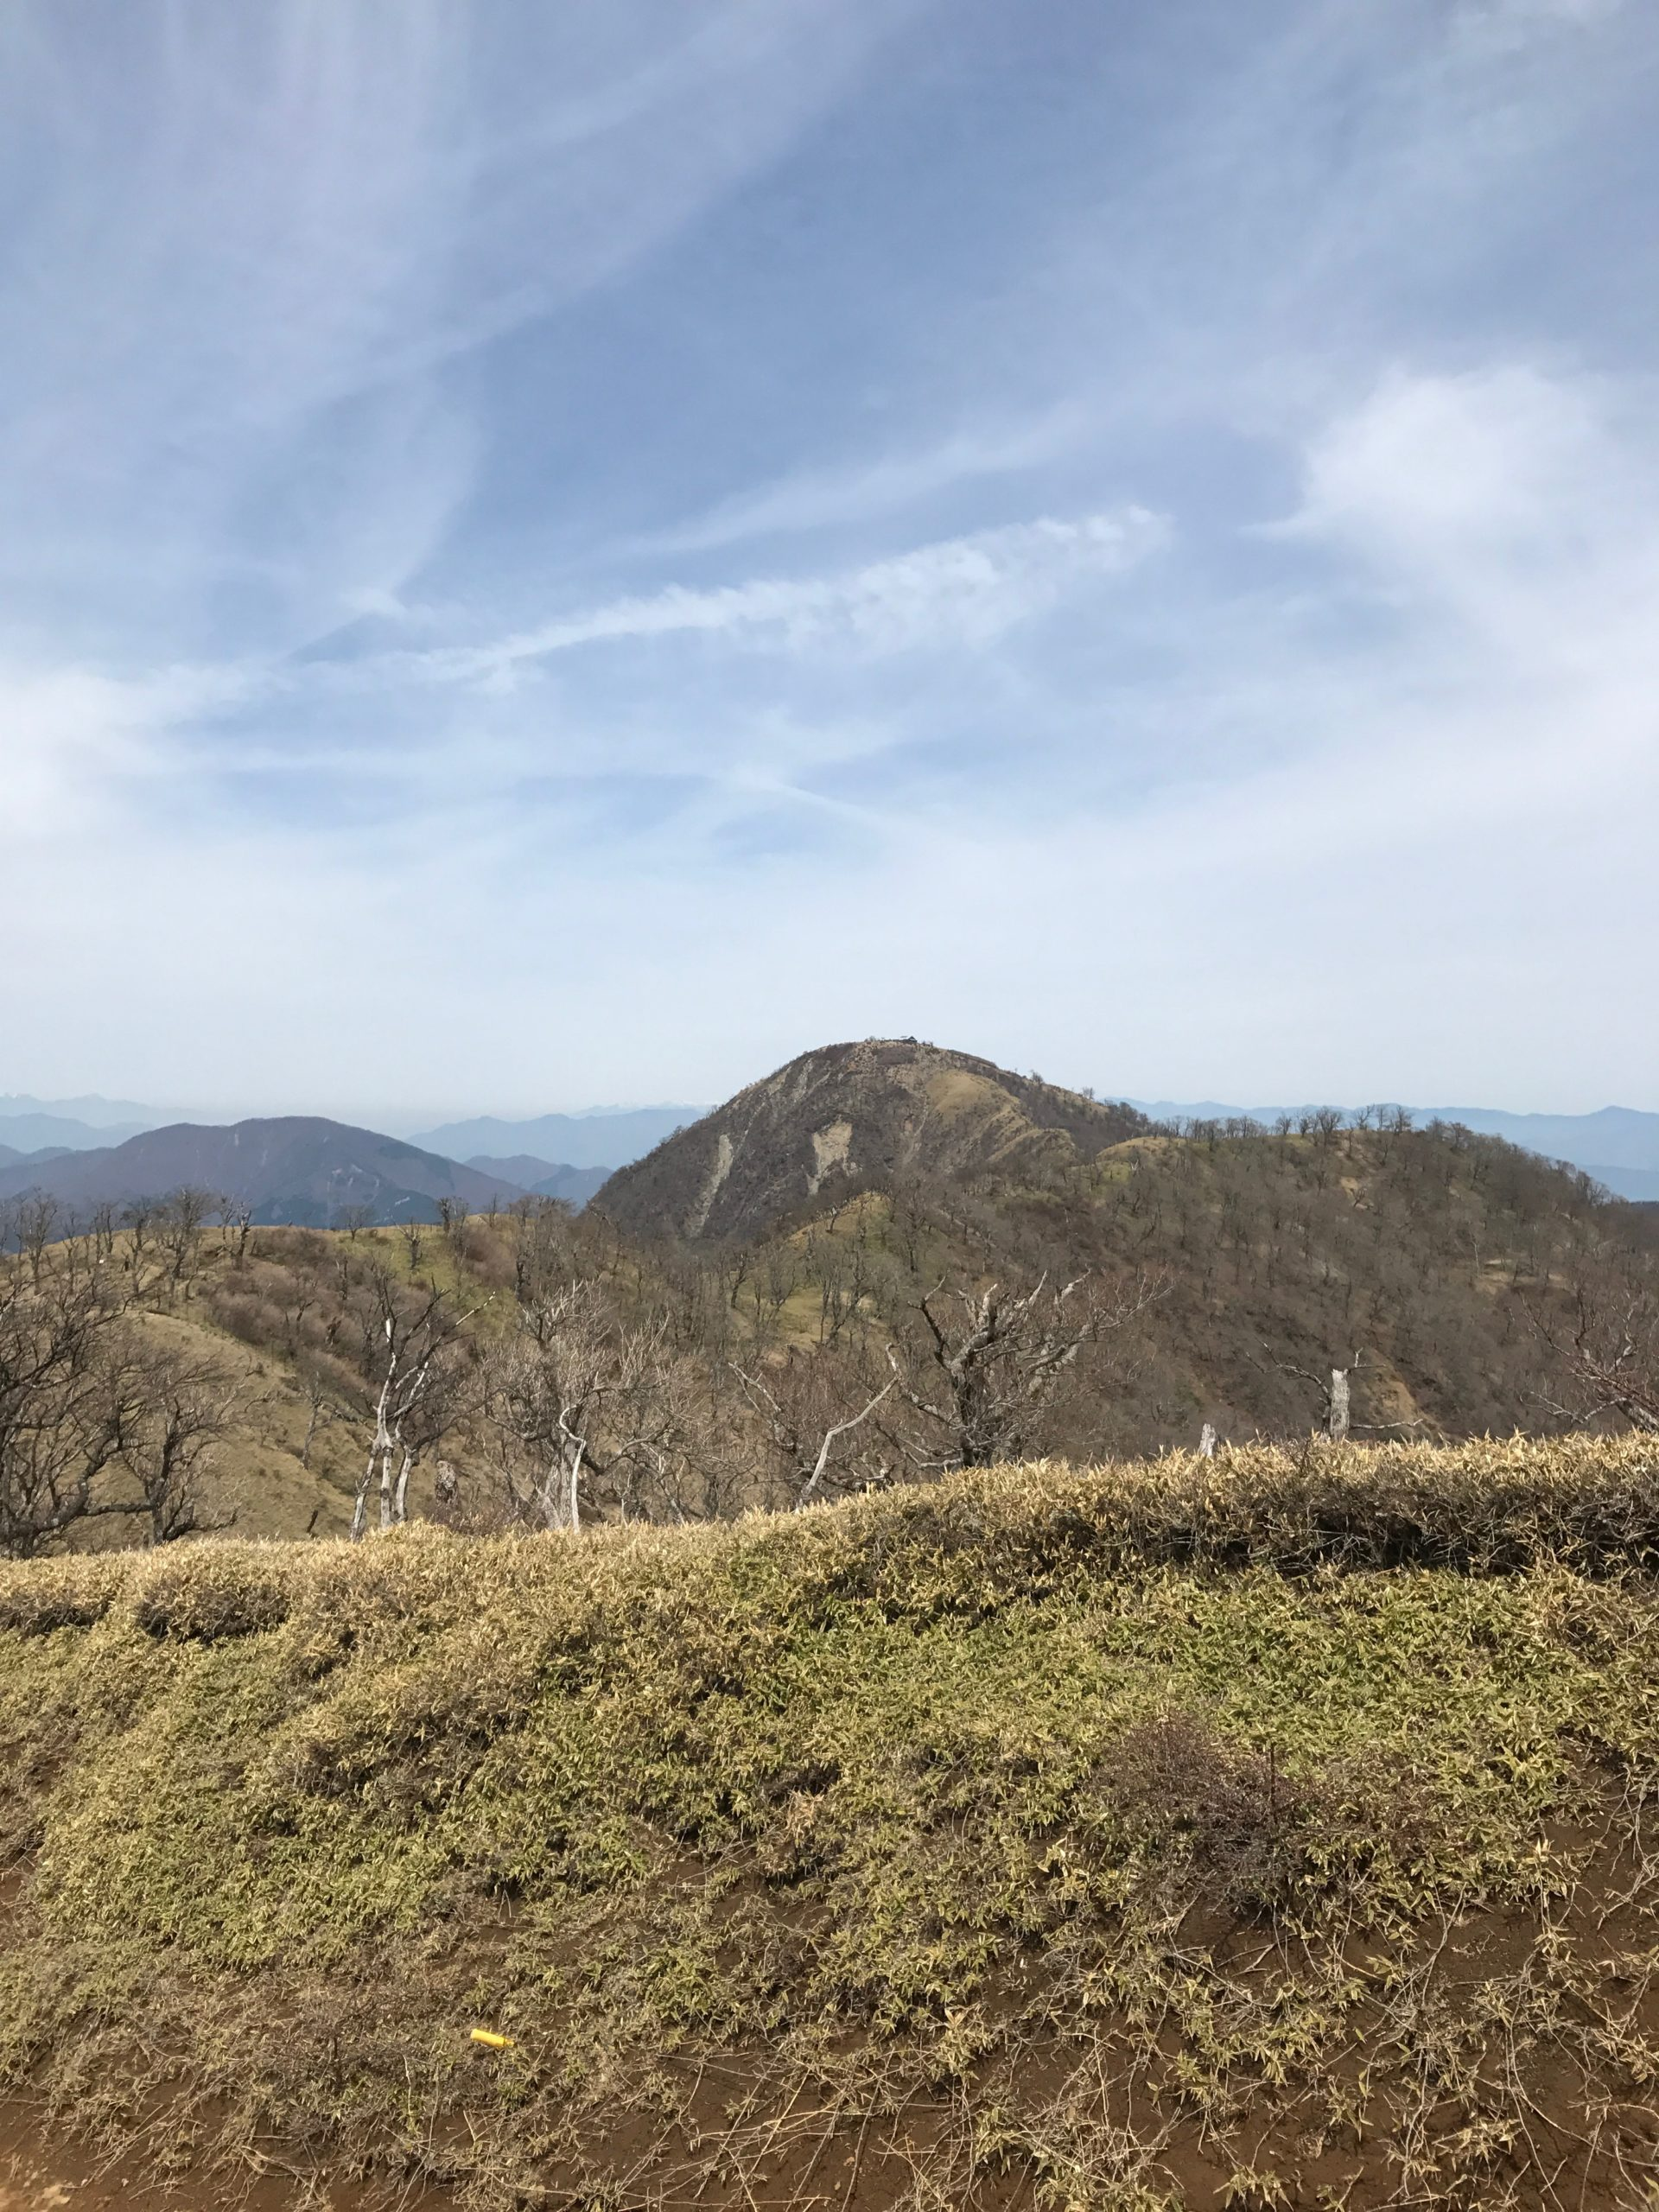 丹沢山 丹沢山〜蛭ヶ岳